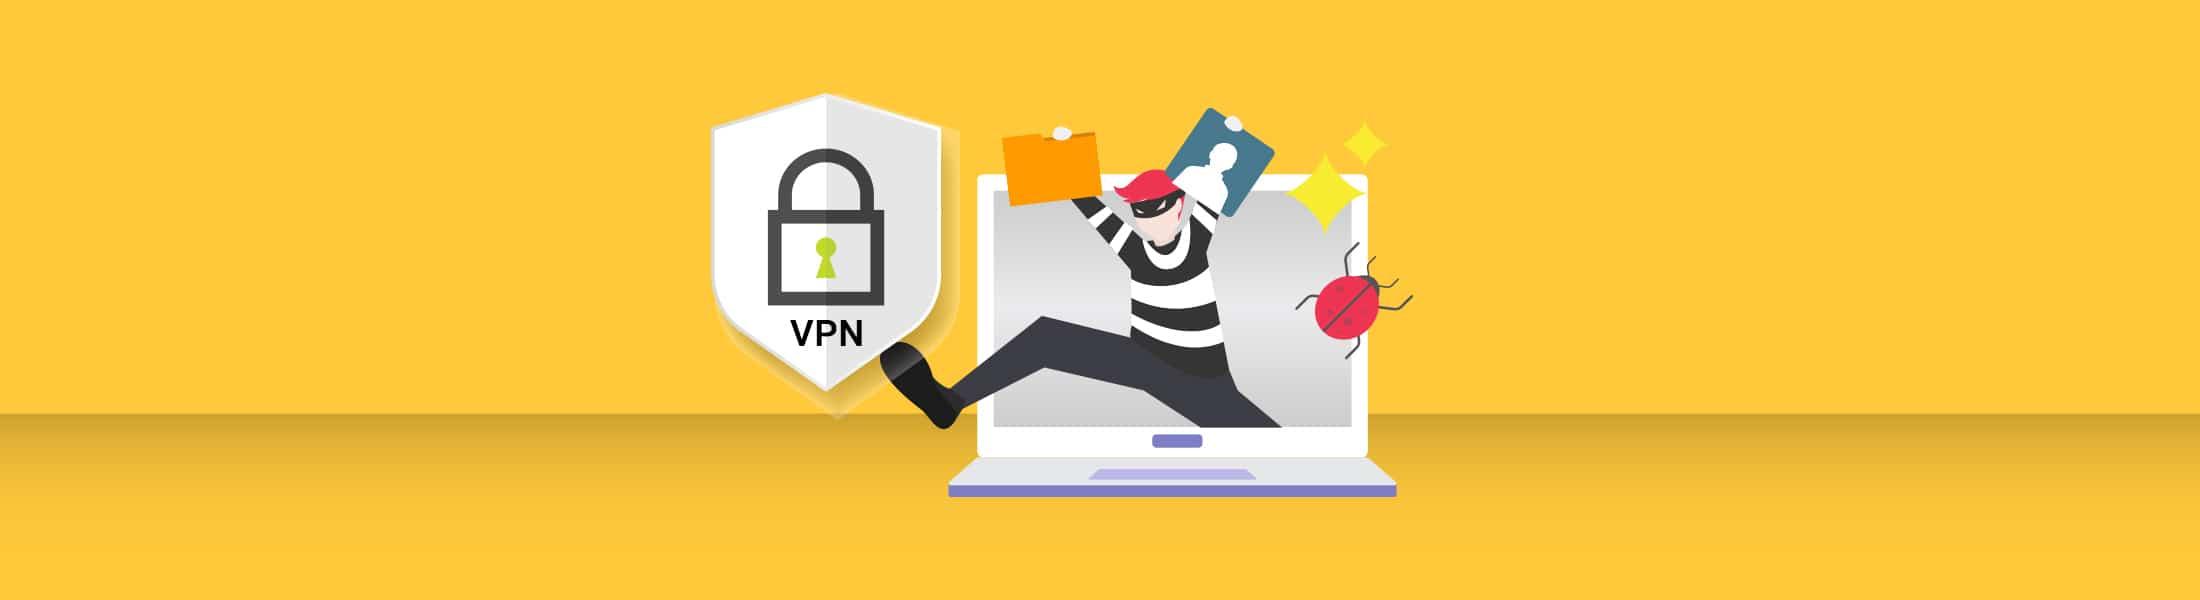 Vulnerable-when-using-a-VPN-